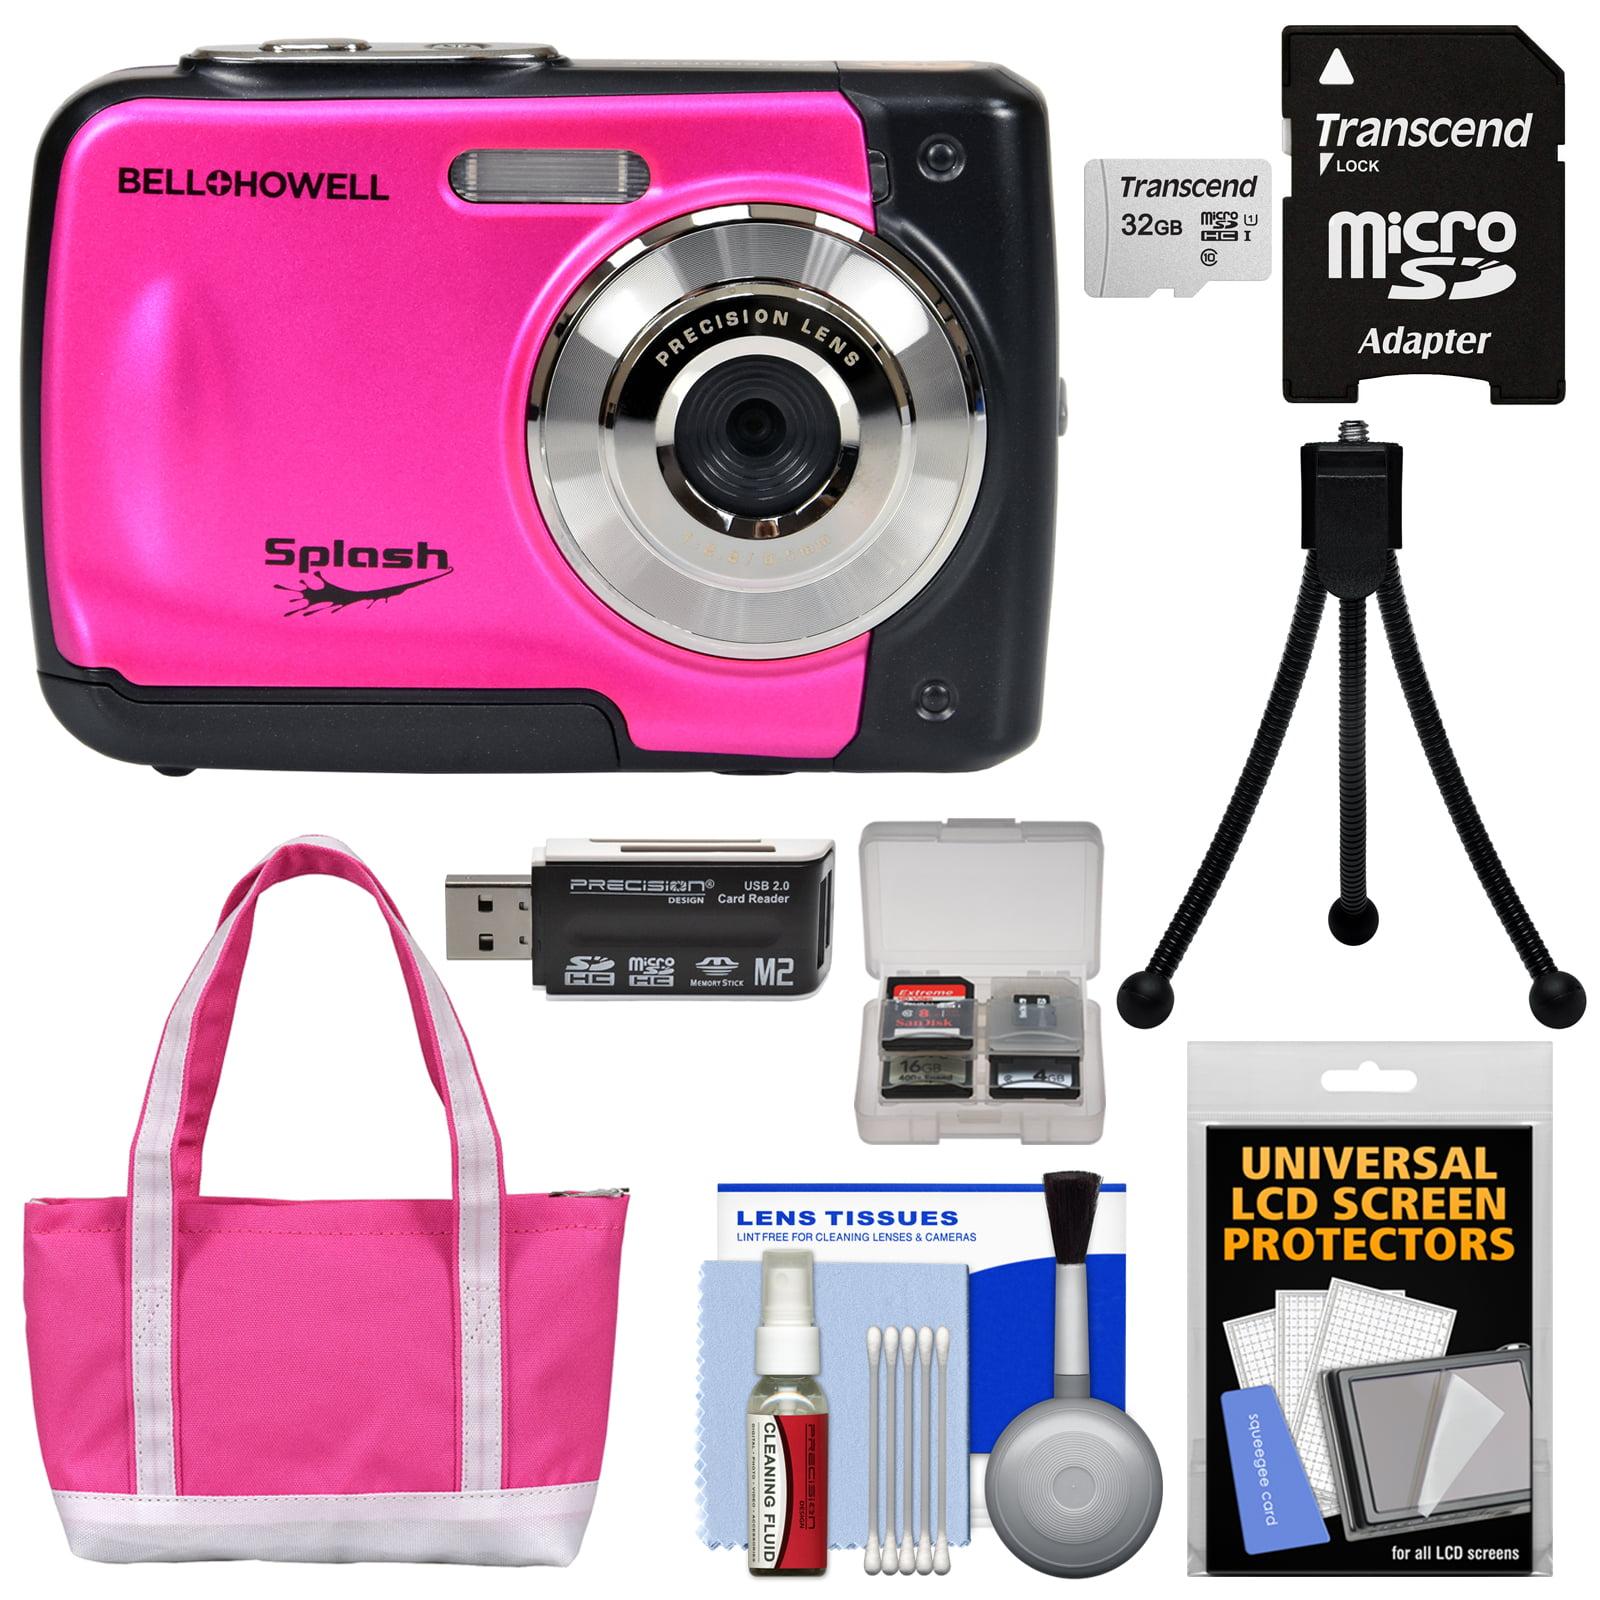 Bell & Howell Splash WP10 Shock & Waterproof Digital Camera (Pink) with 16GB Card + Batteries & Charger + Case + Flex Tripod + Kit